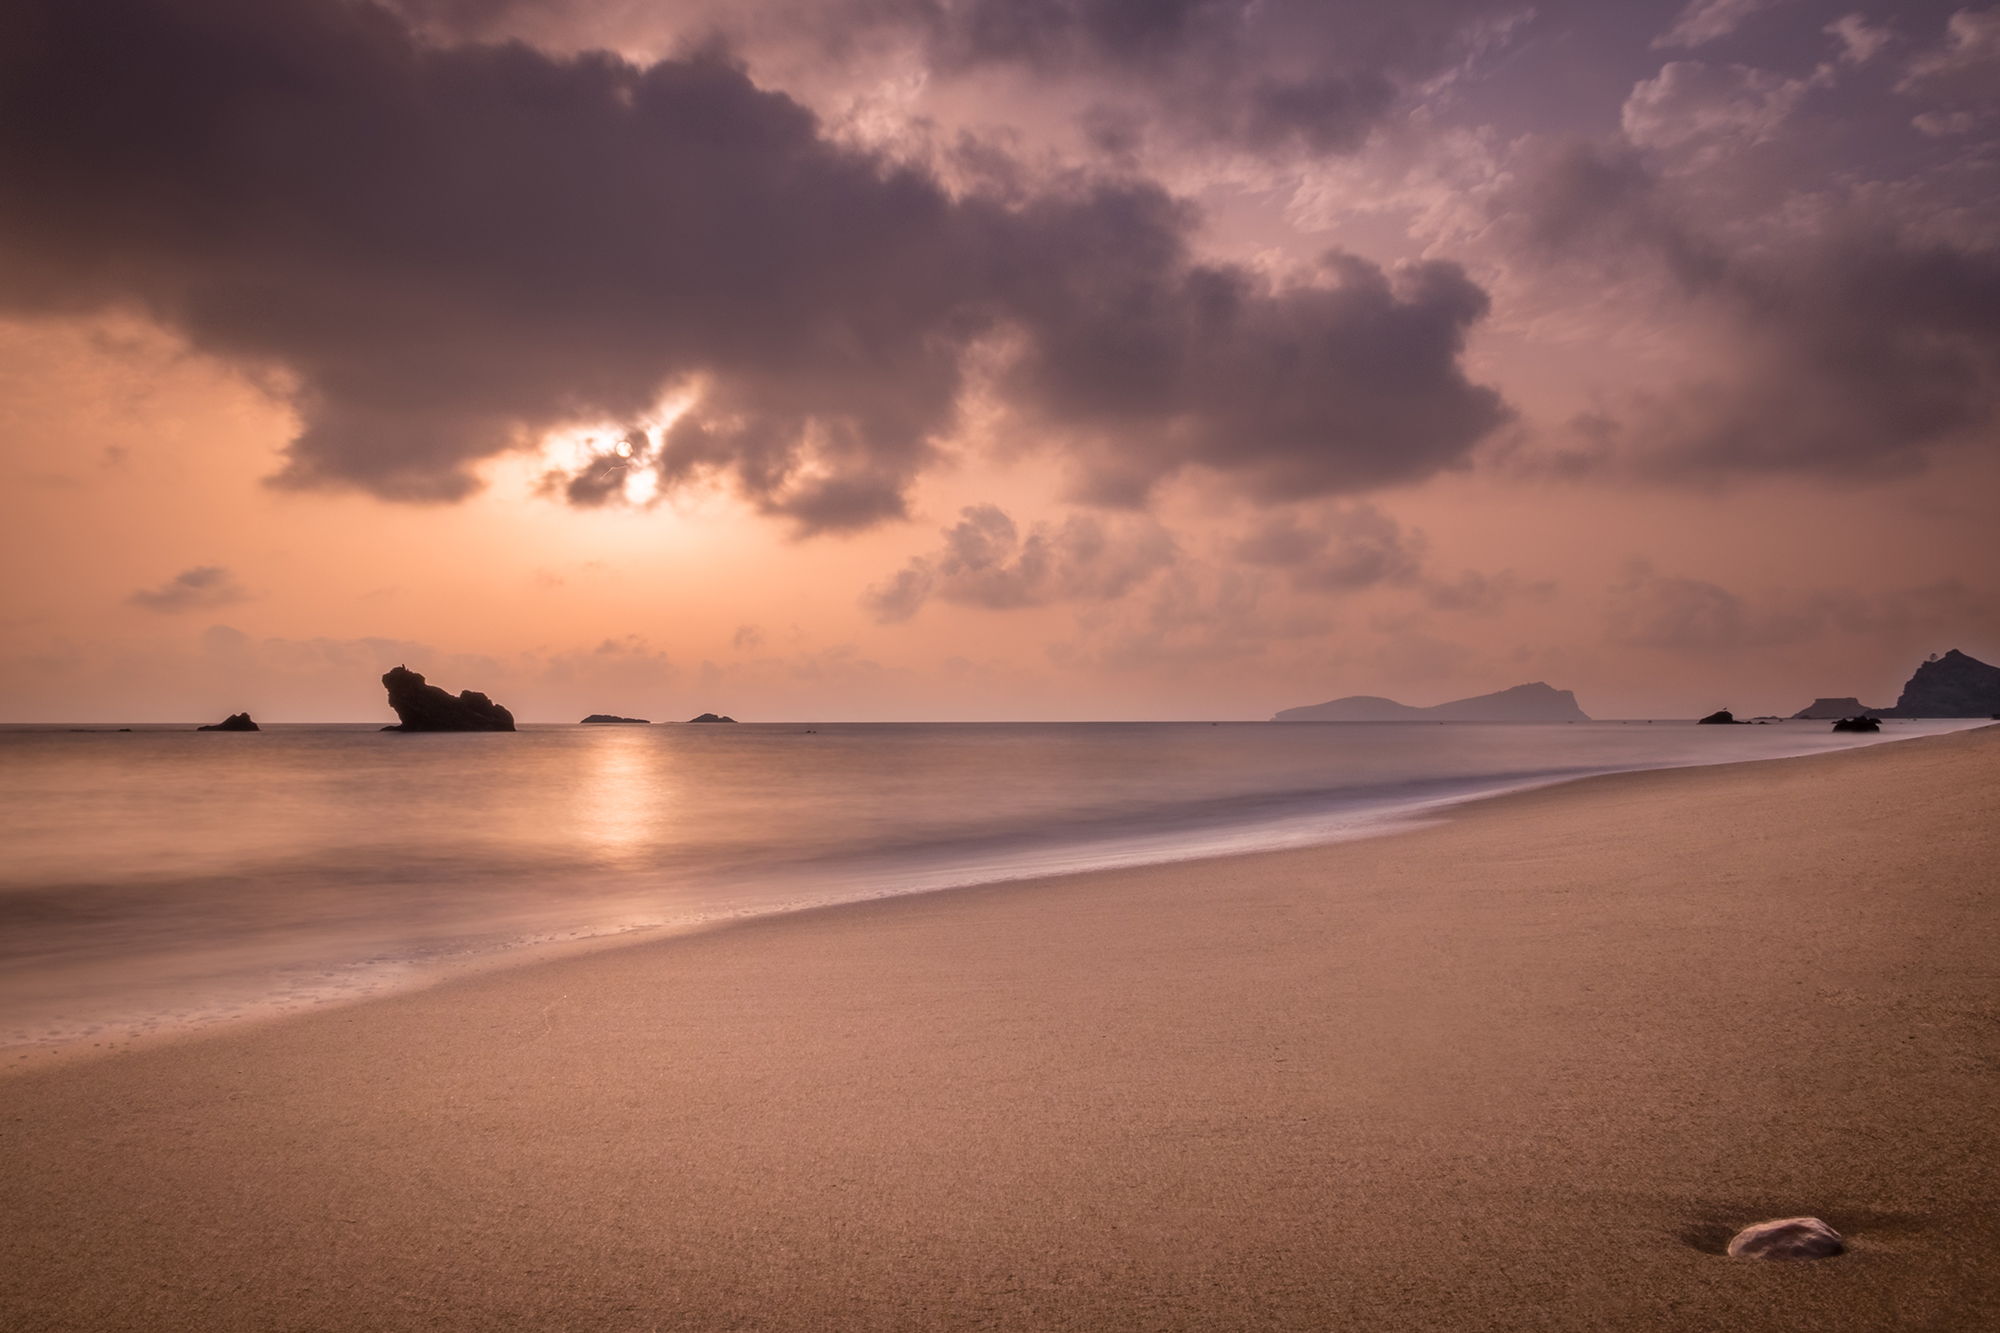 160829 - Ibiza - Sunrise - Es Figueral 002.jpg